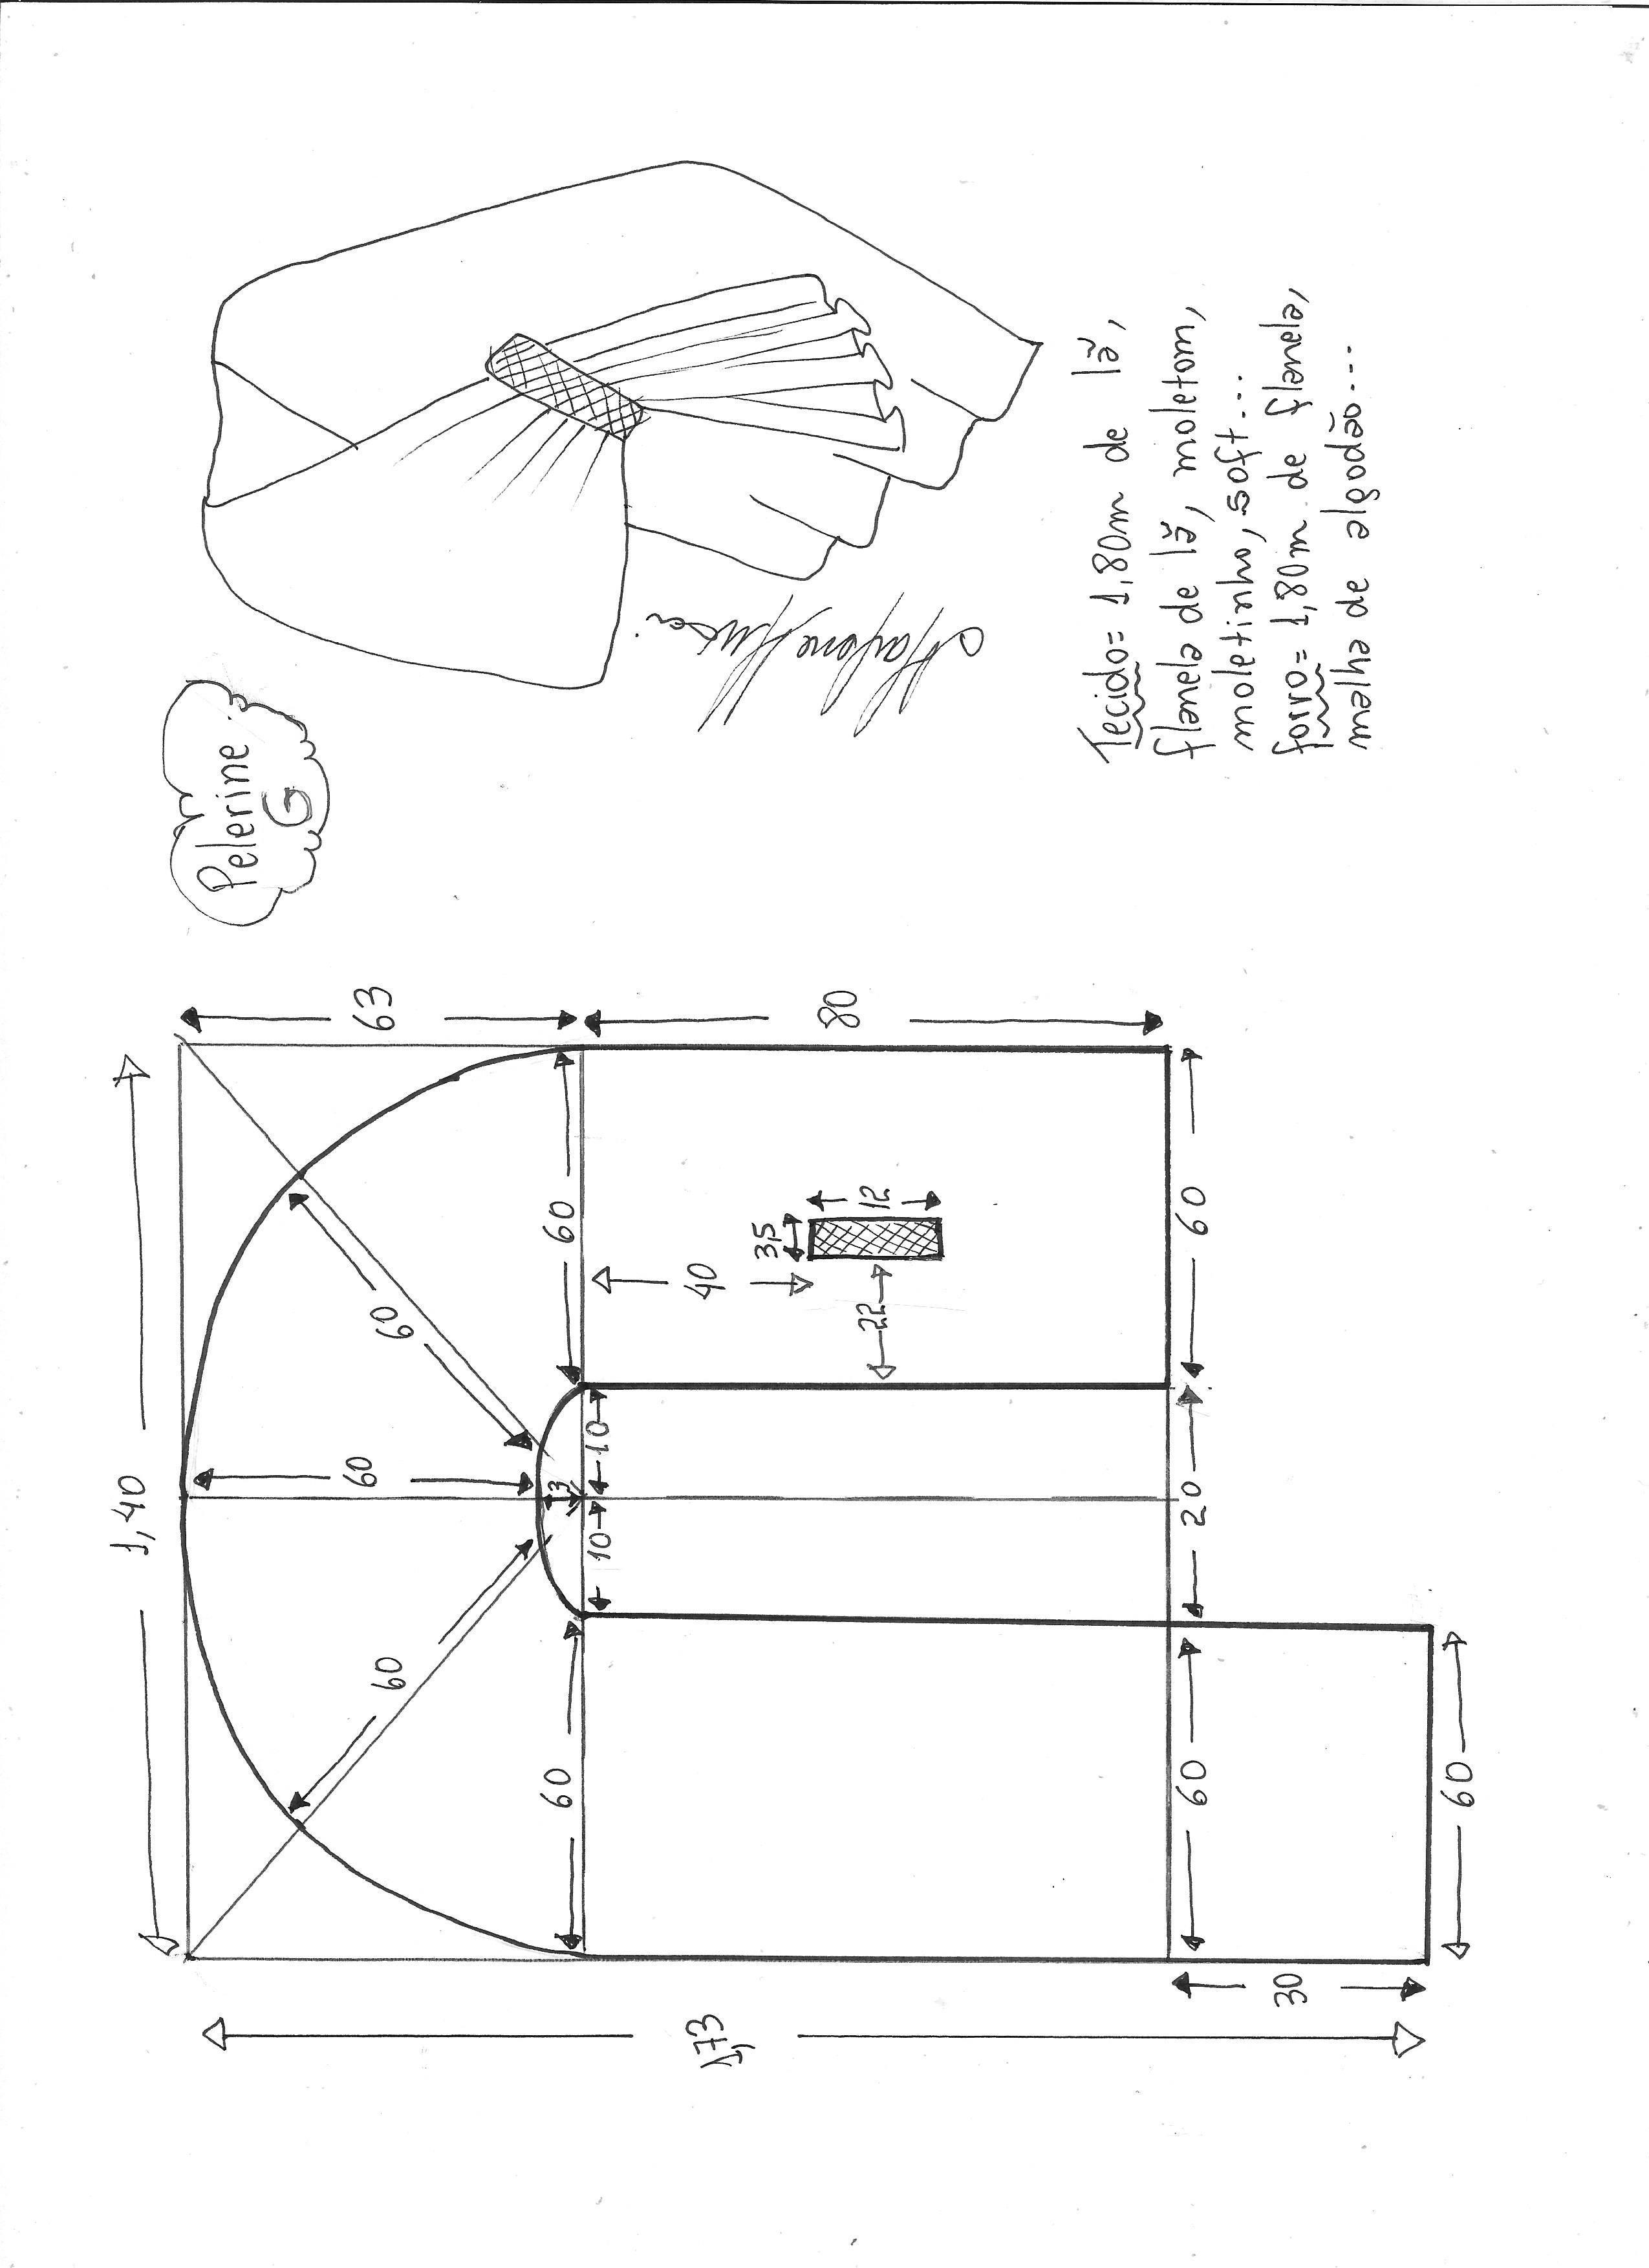 Pin de nadia saab en Sewing patterns   Pinterest   Costura, Capa y ...